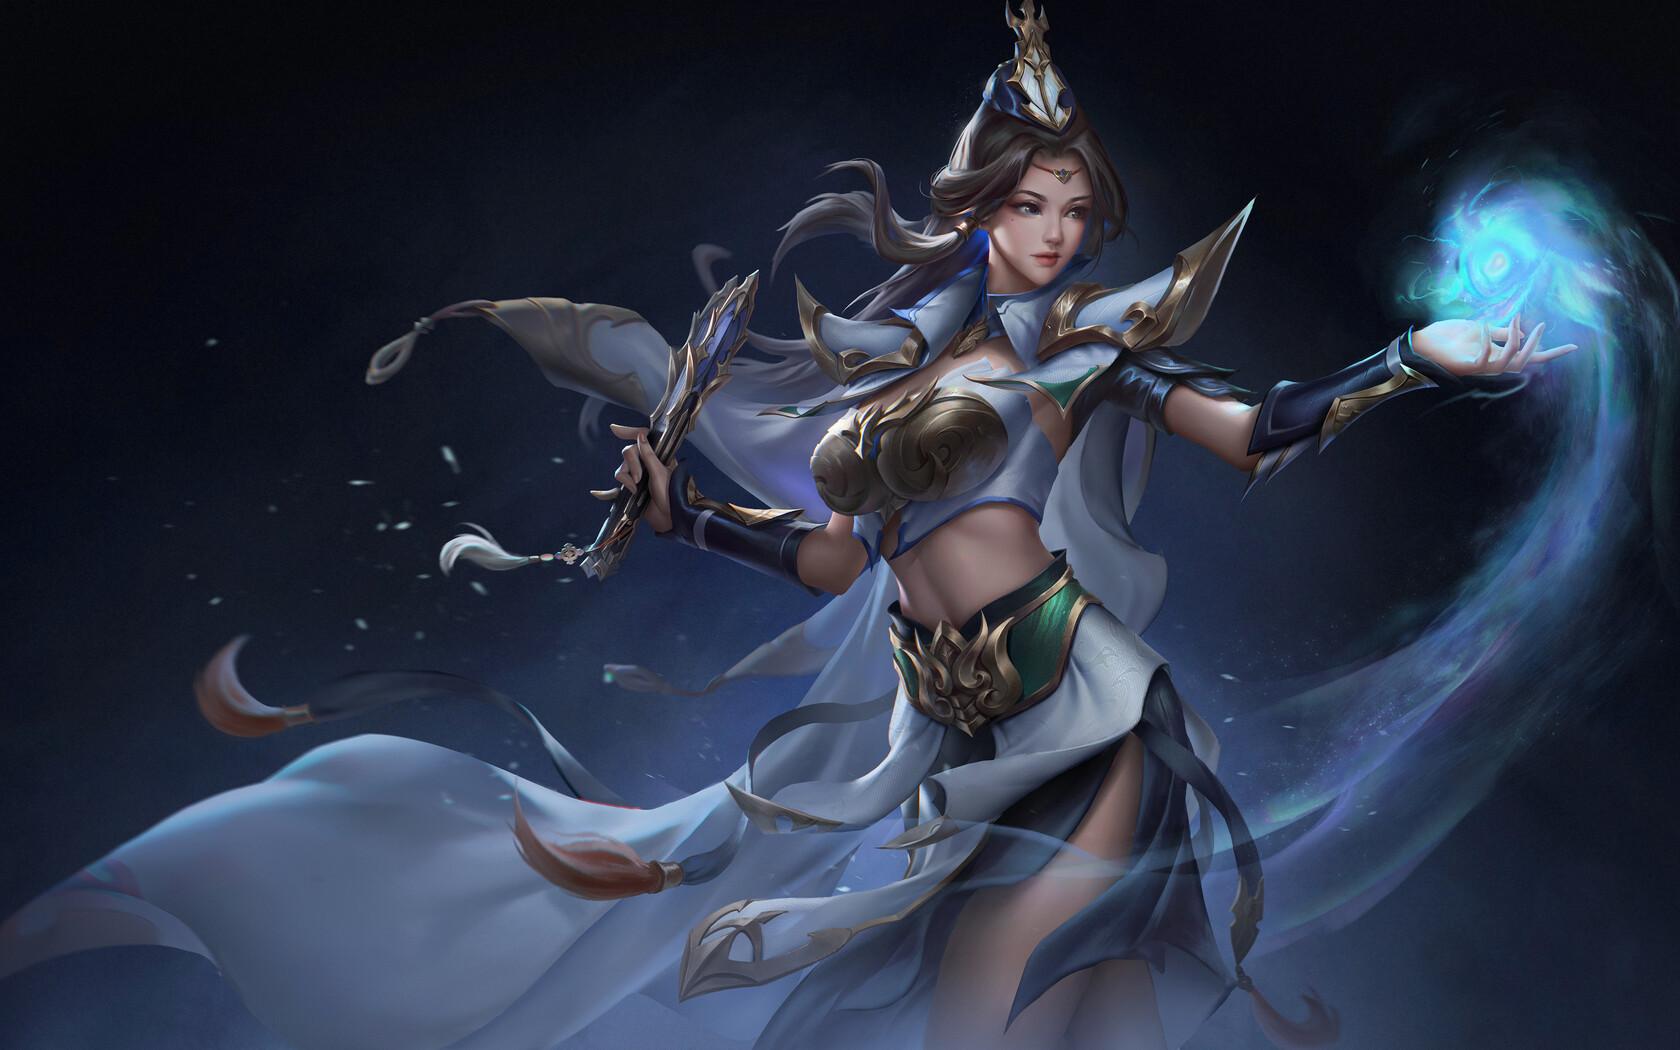 warrior-girl-with-powers-fantasy-4k-7t.jpg